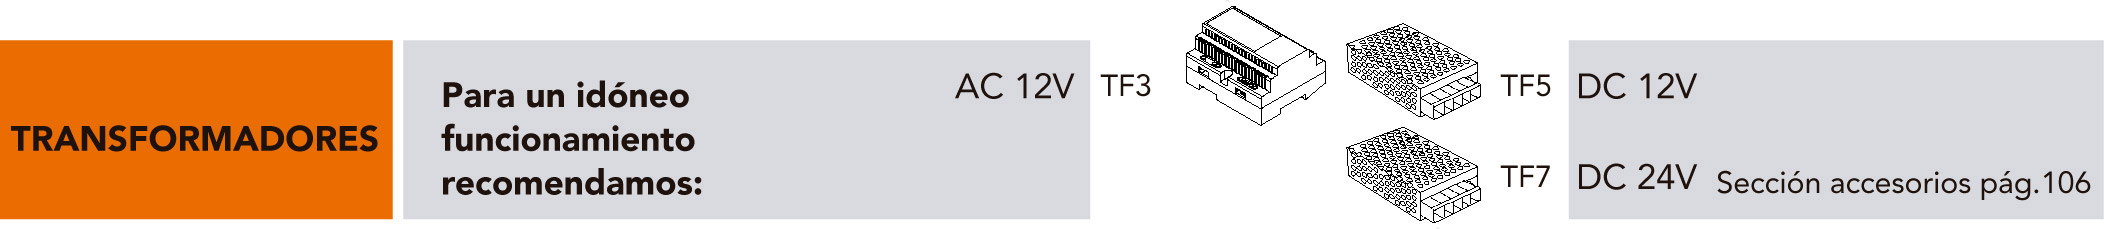 S42-43_transformadores